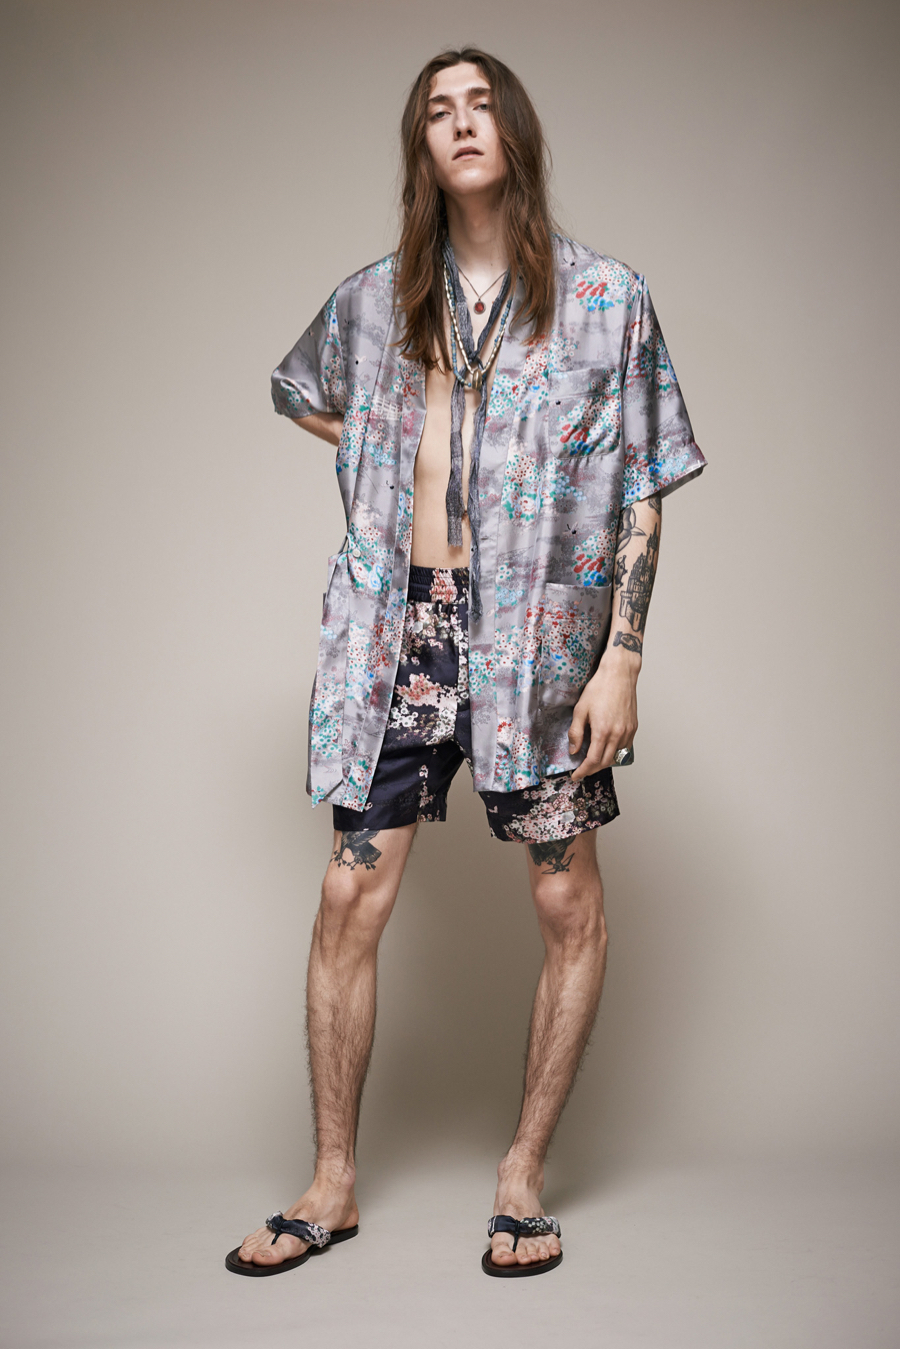 Marc Jacobs Spring/Summer 2016 Menswear Collection | Milan Fashion Week